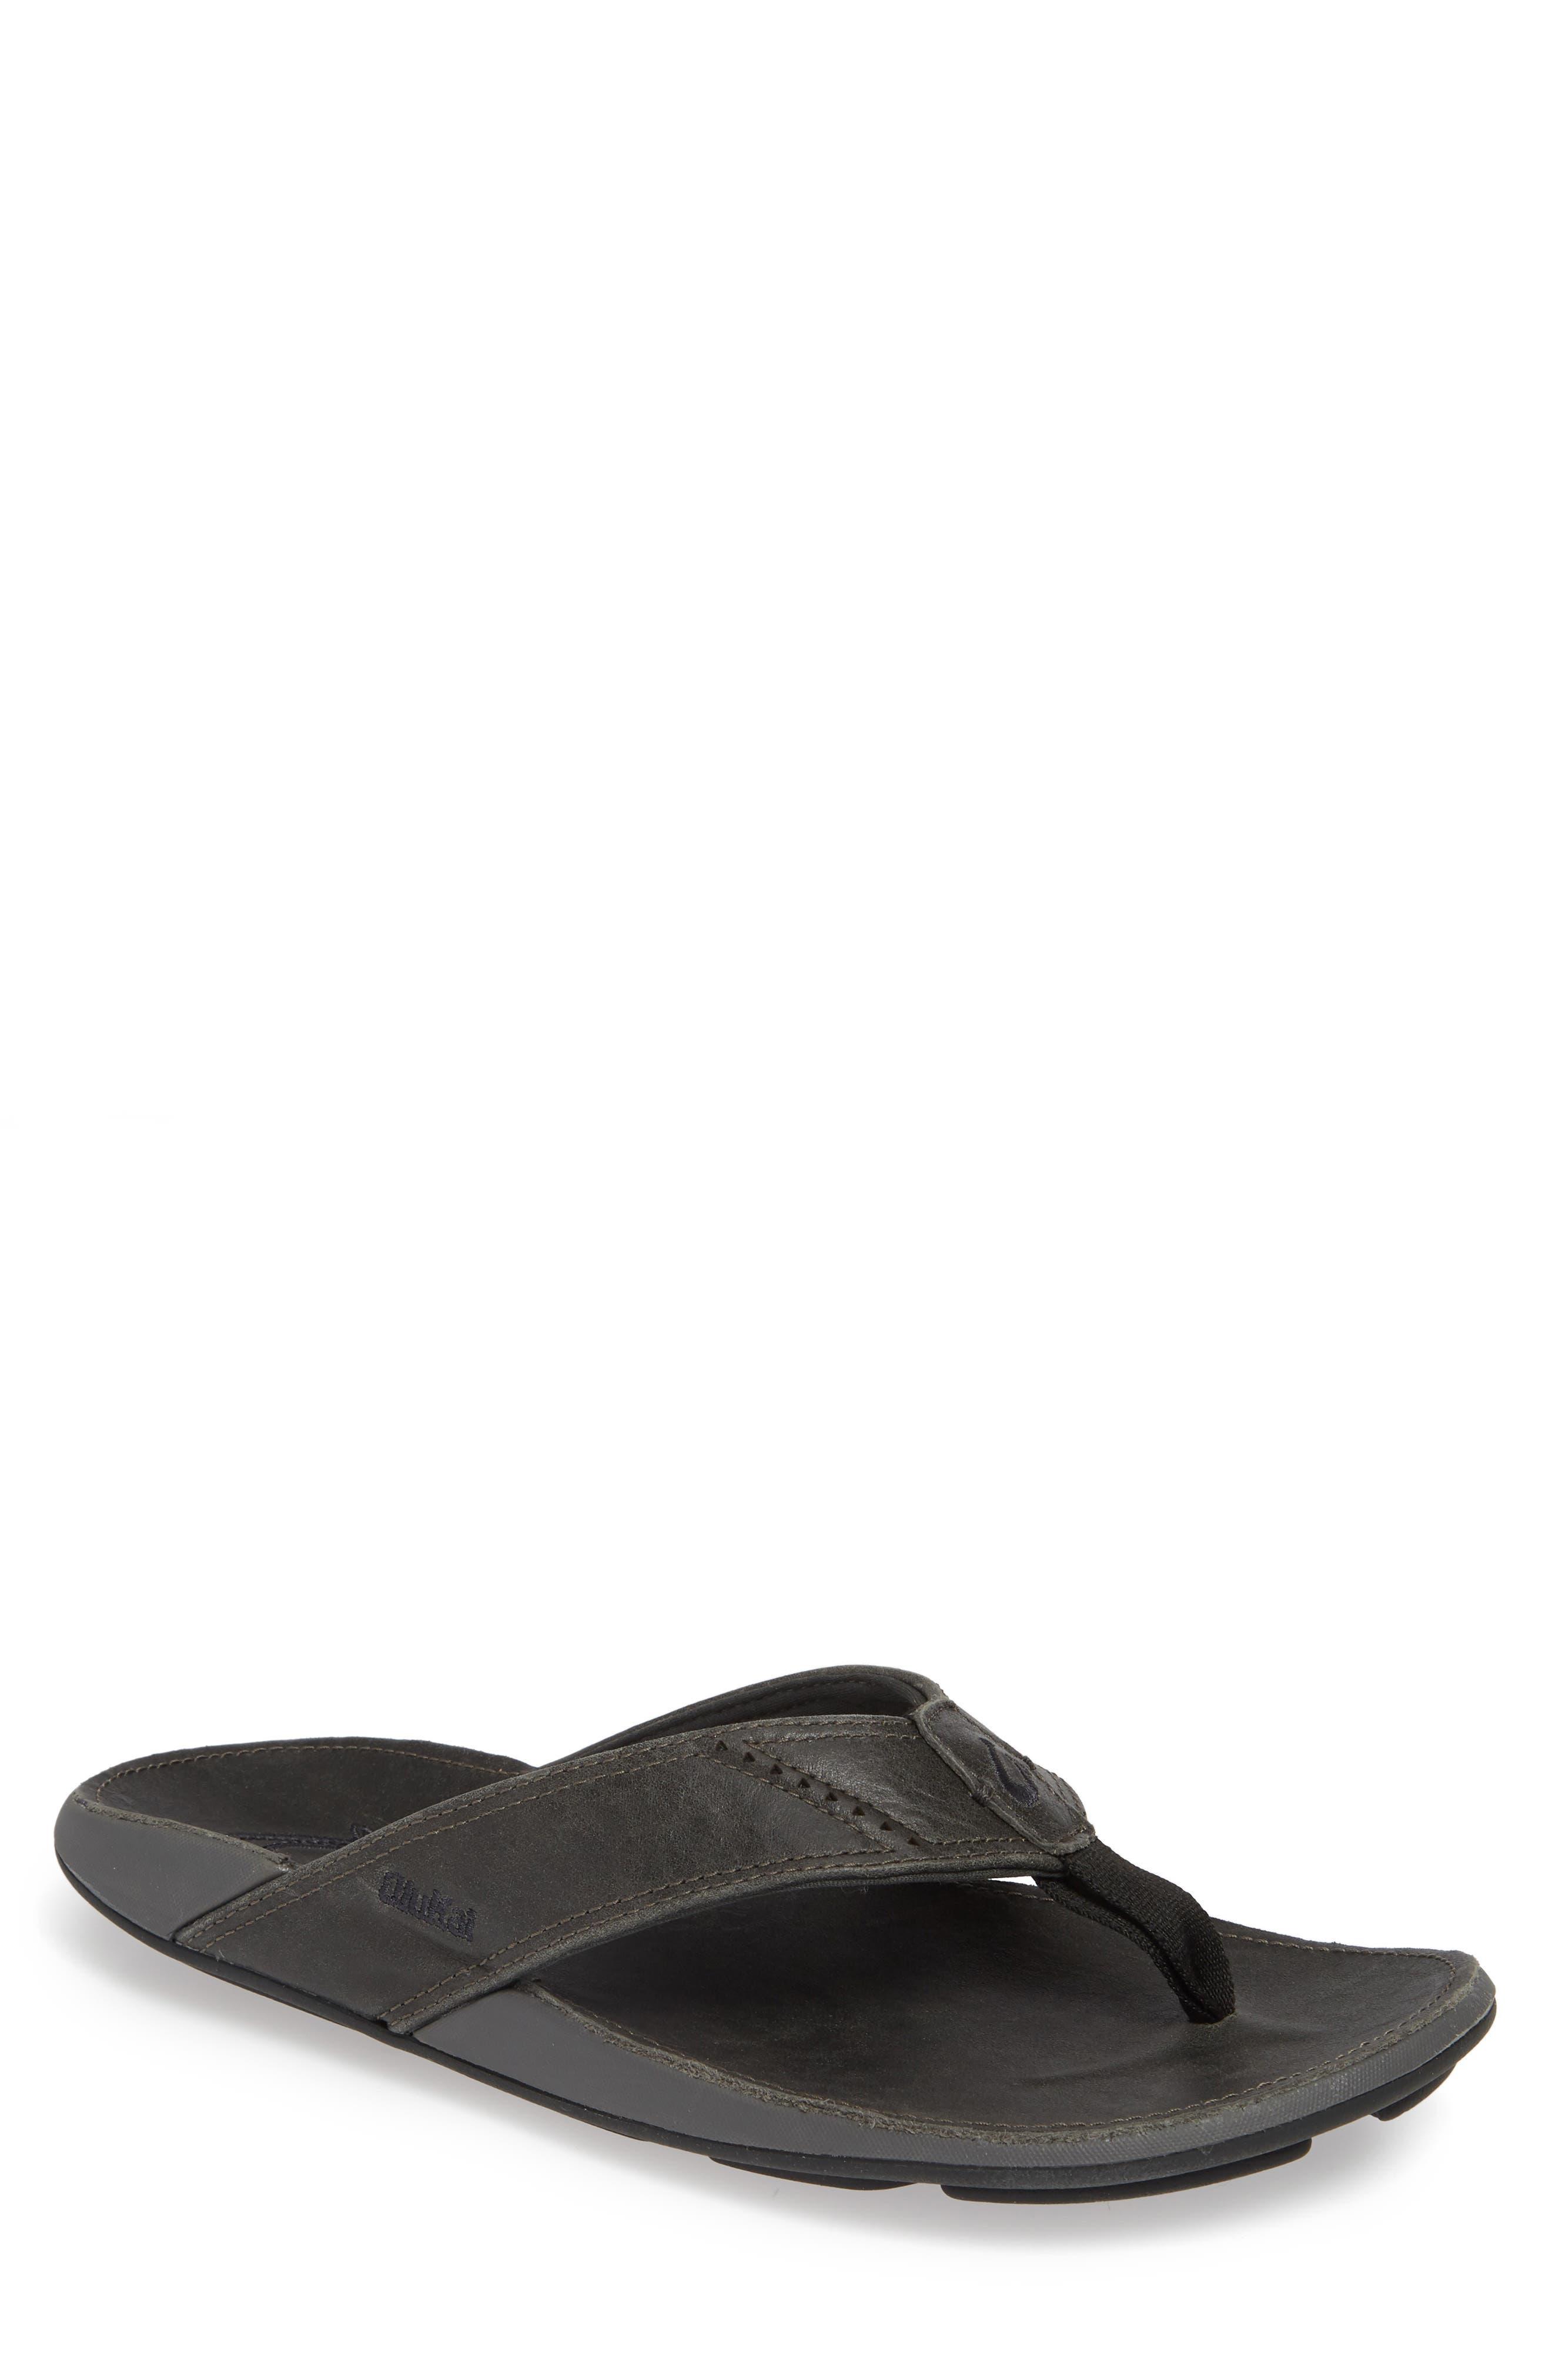 'Nui' Leather Flip Flop, Main, color, LAVA ROCK LEATHER